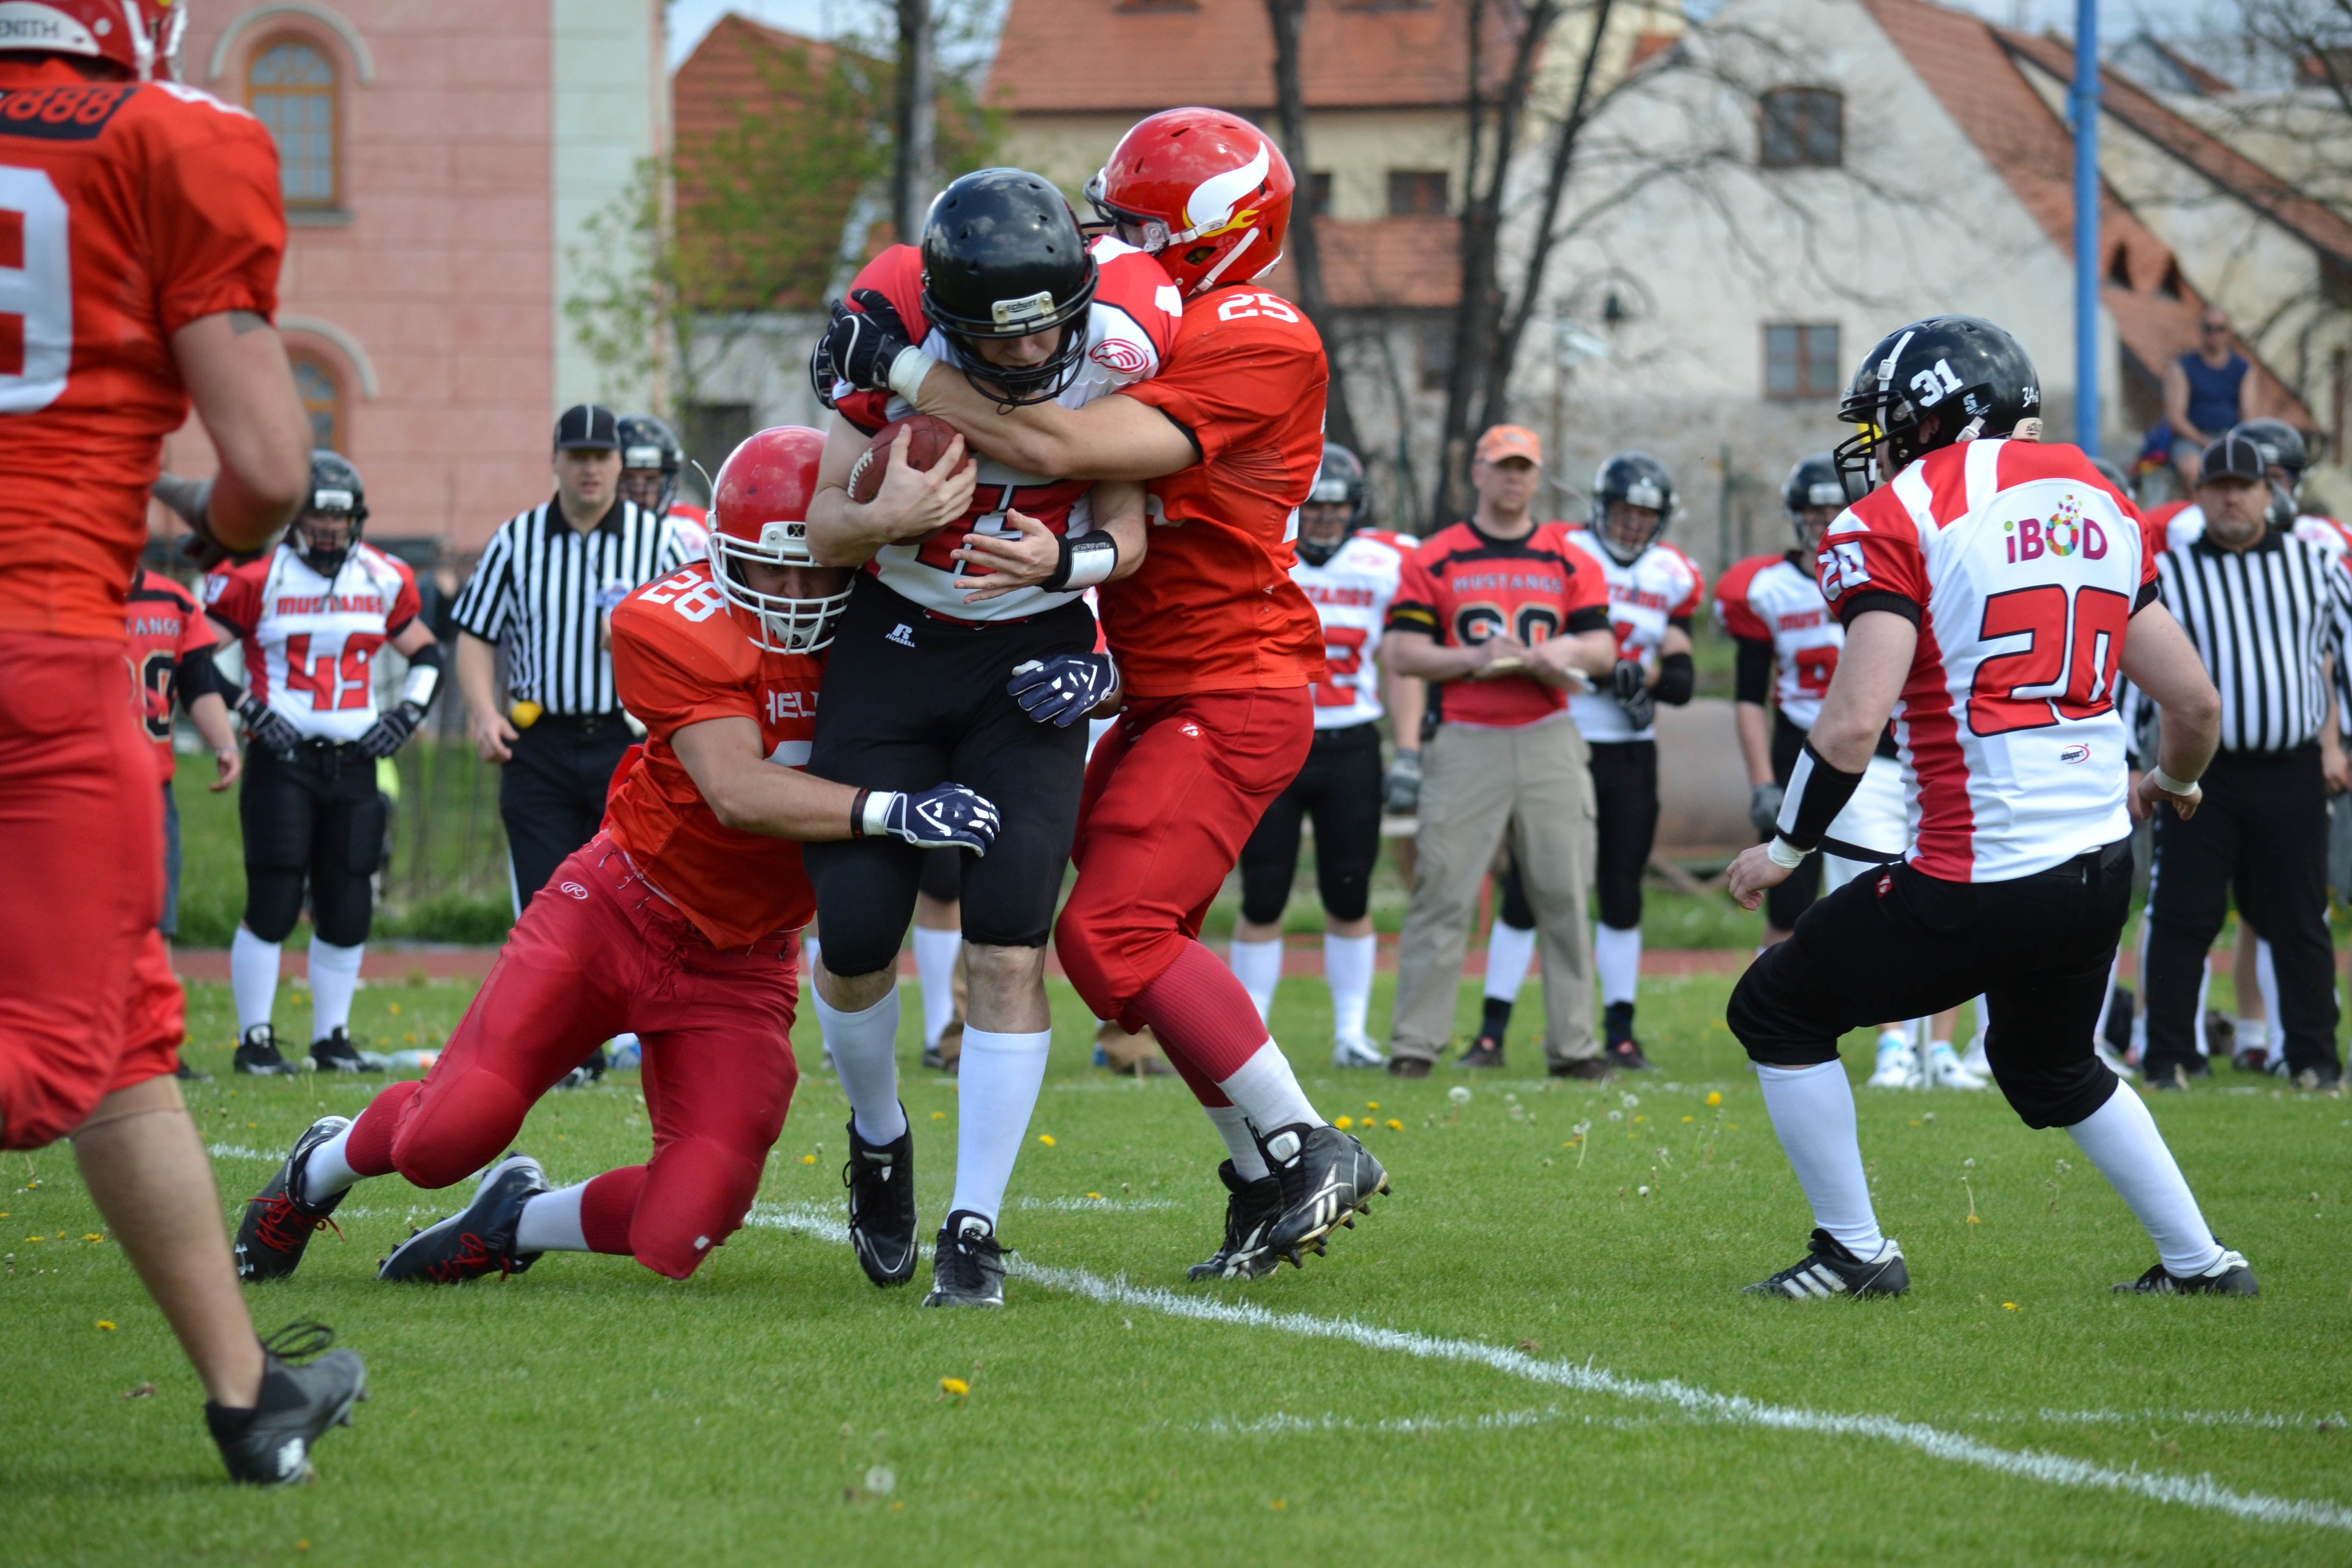 Kids playing American Football image - Free stock photo ...